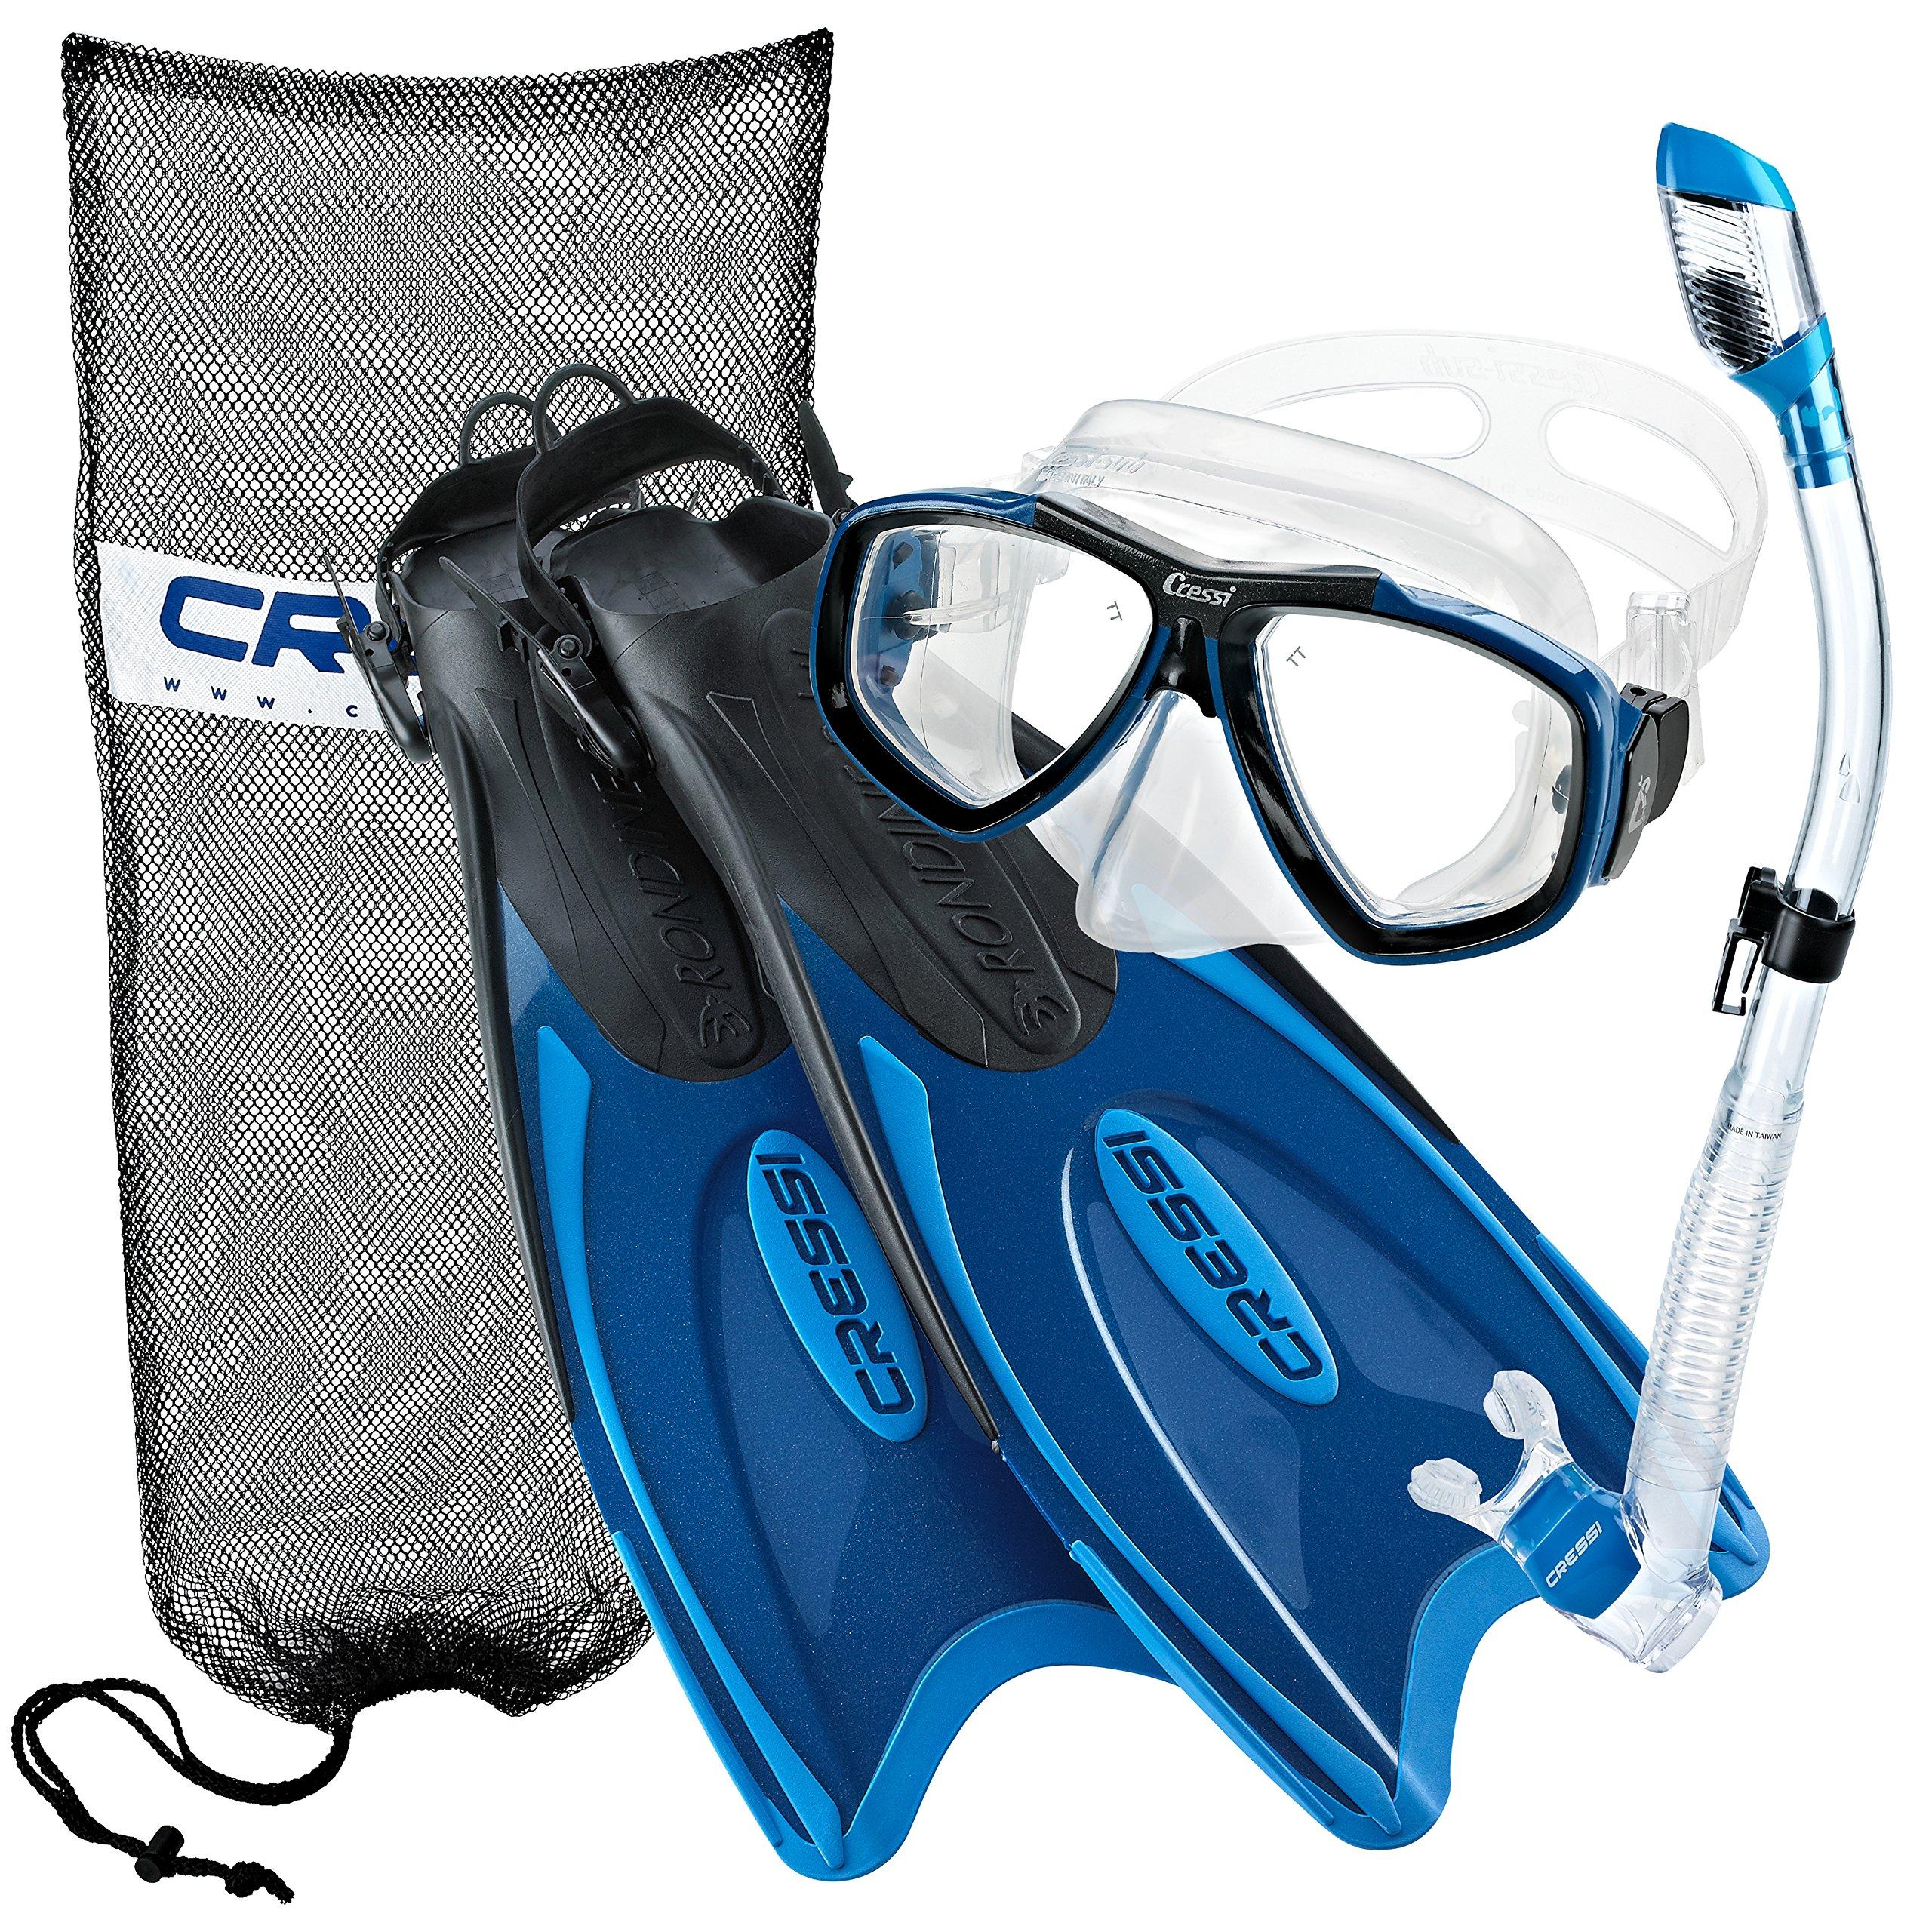 Cressi Palau Long Fins, Focus Mask, Dry Snorkel, Snorkeling Gear Package, Blue-Large/X-Large